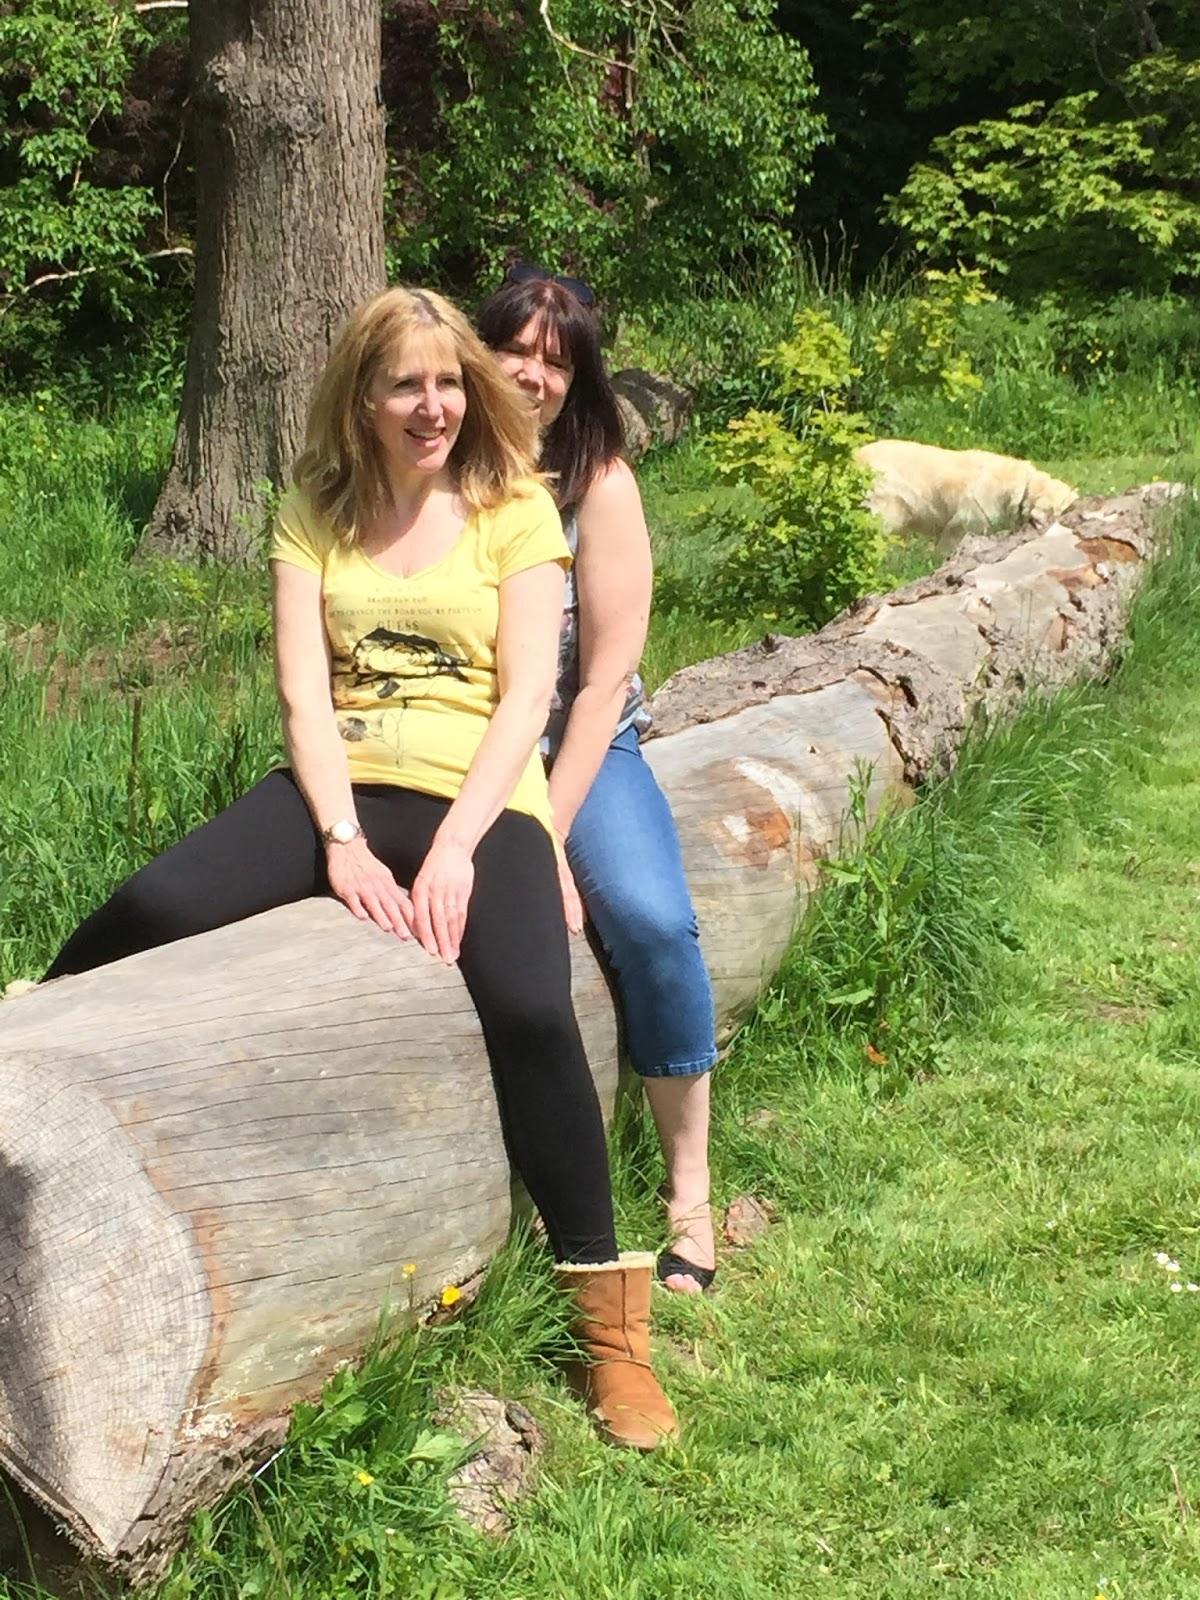 Linda & Sarah on a log at National Trust Dyffryn Gardens